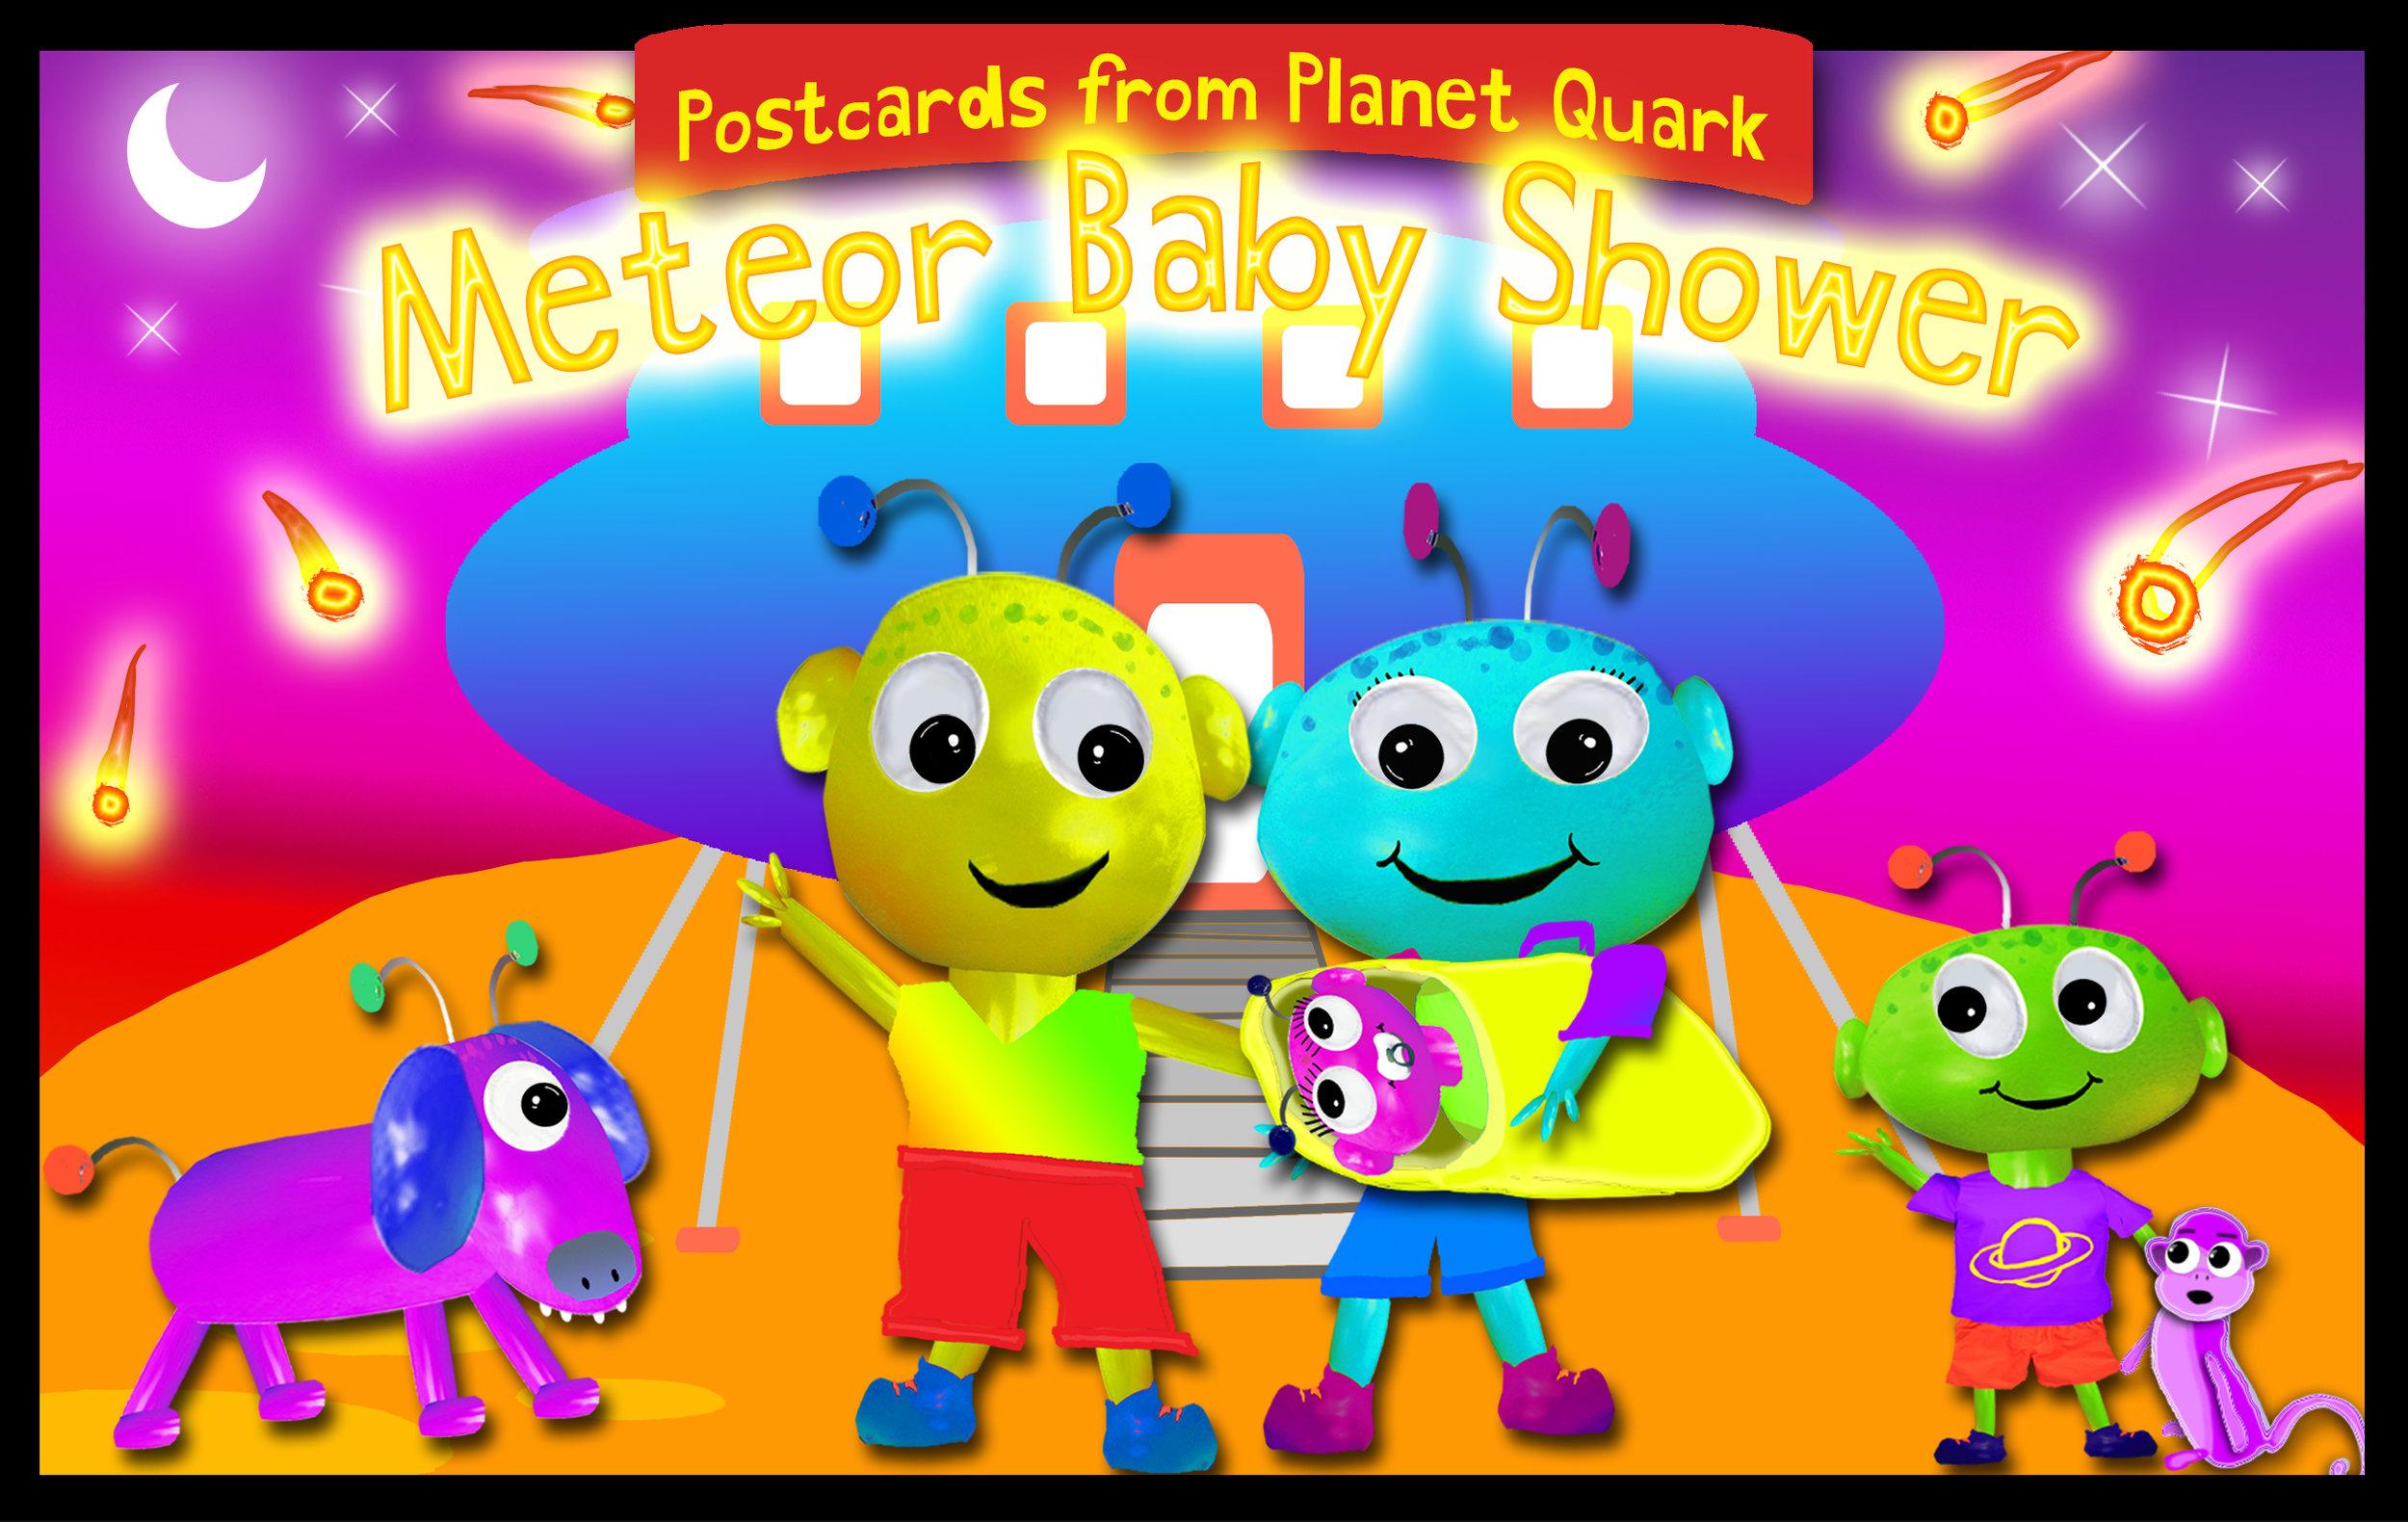 Meteor Baby Shower.jpg